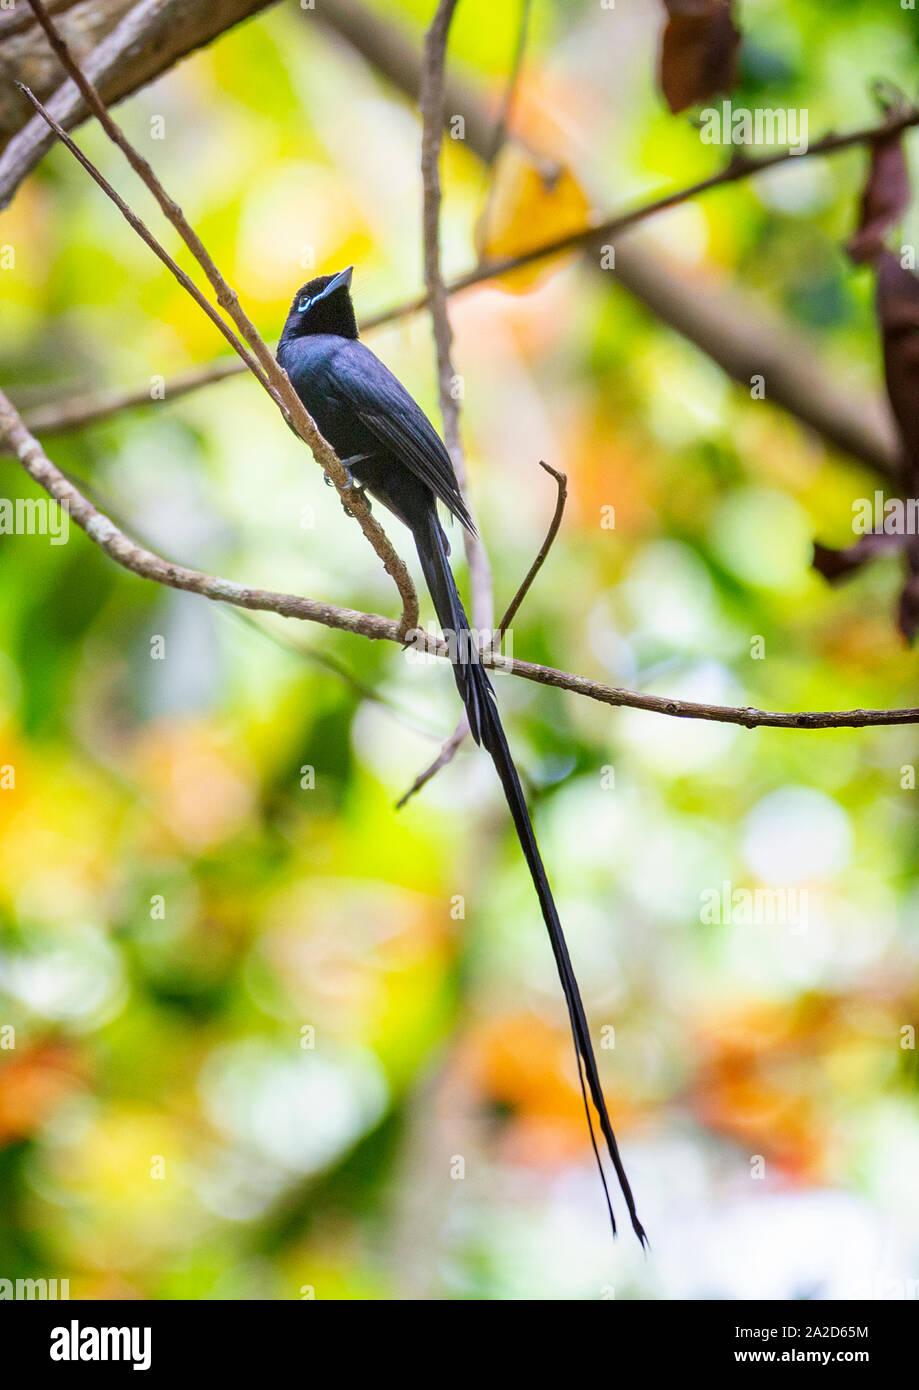 Male Seychelles Paradise Flycatcher, La Digue, Seychelles Stock Photo